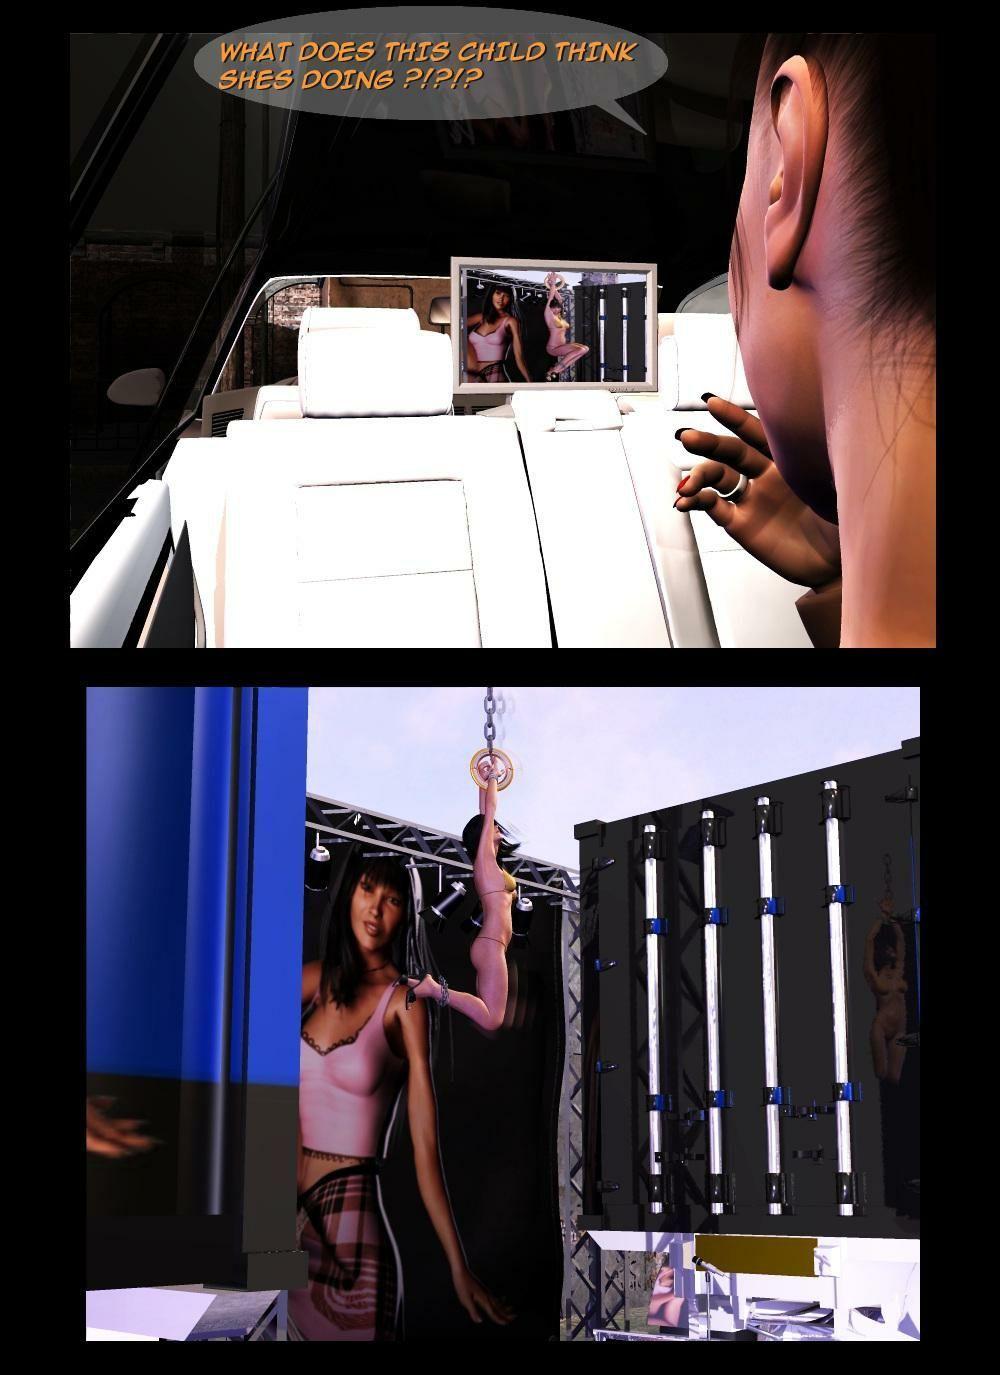 Carey Queen of Escapes - The amazing teen escape artist